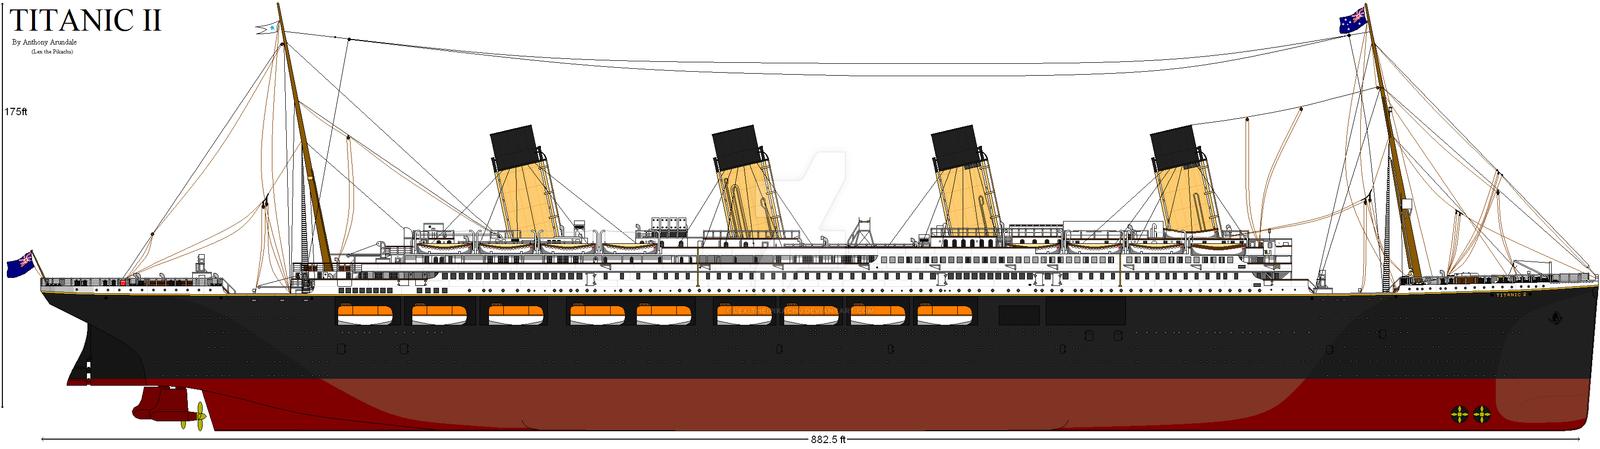 Titanic ii by crystal eclair on deviantart - Construccion del titanic ...